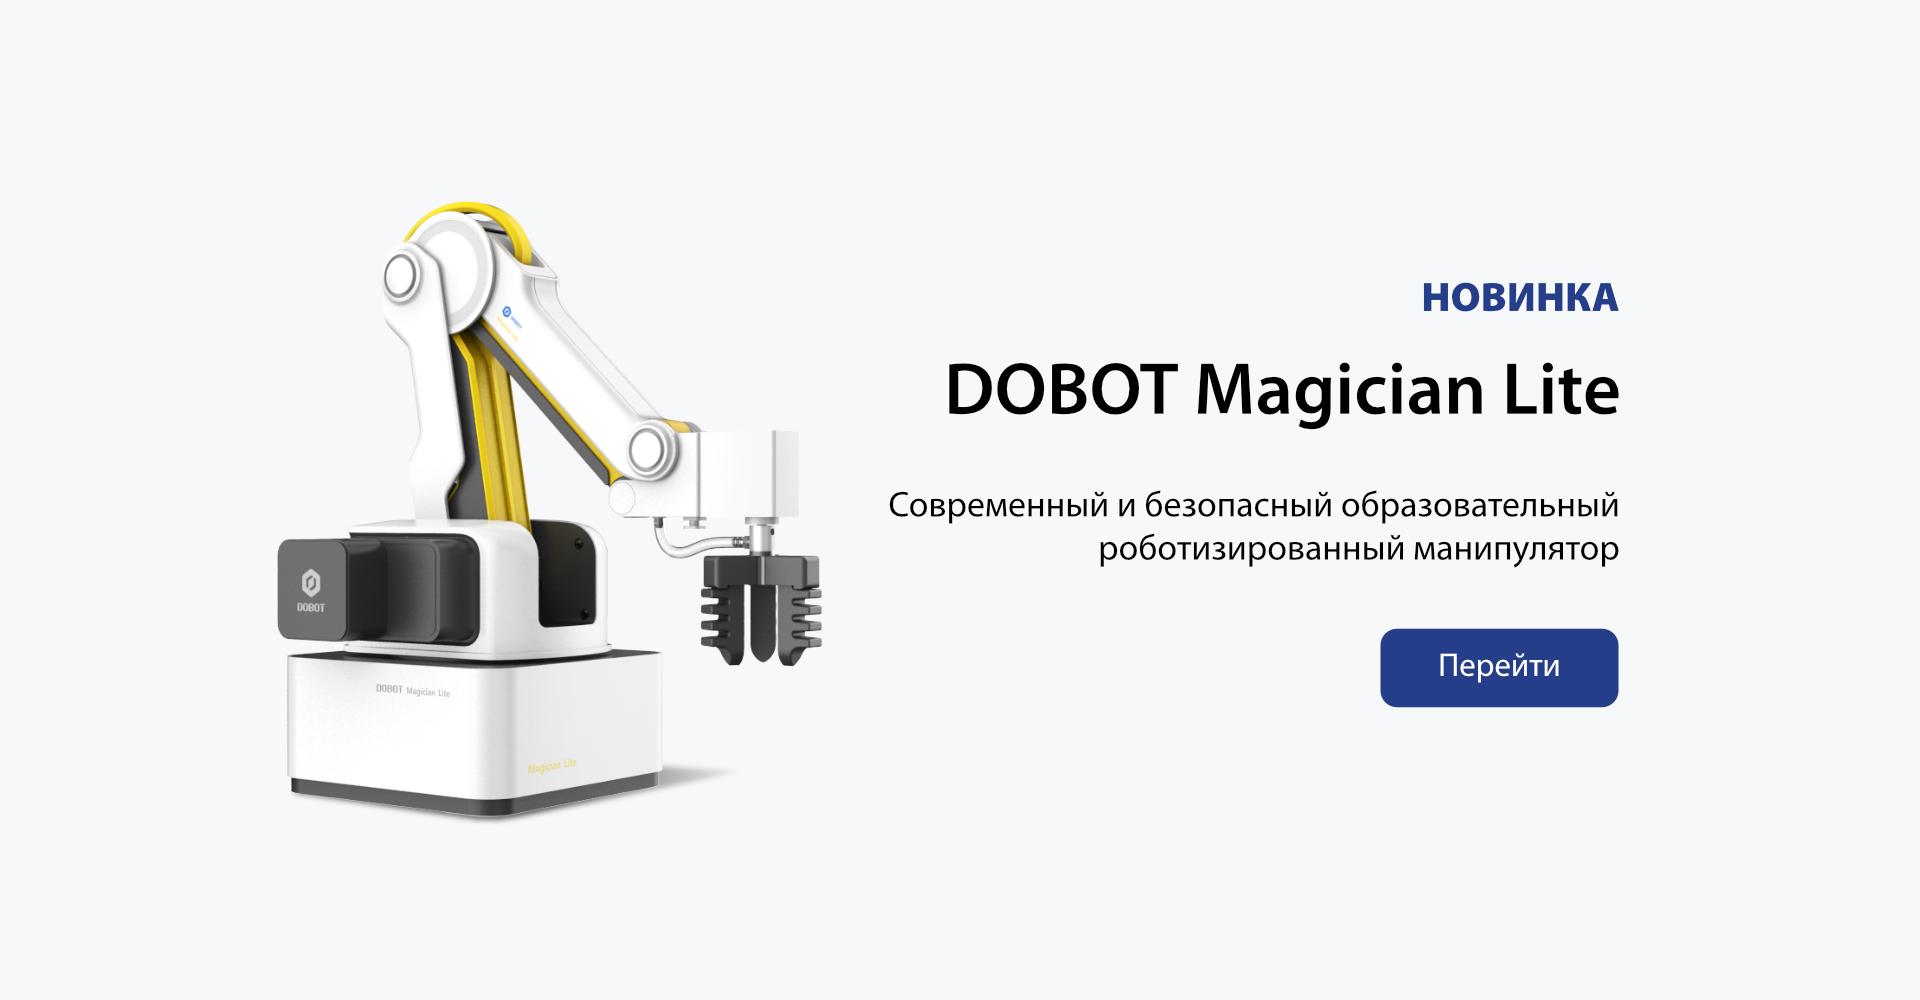 Dobot Magician Lite